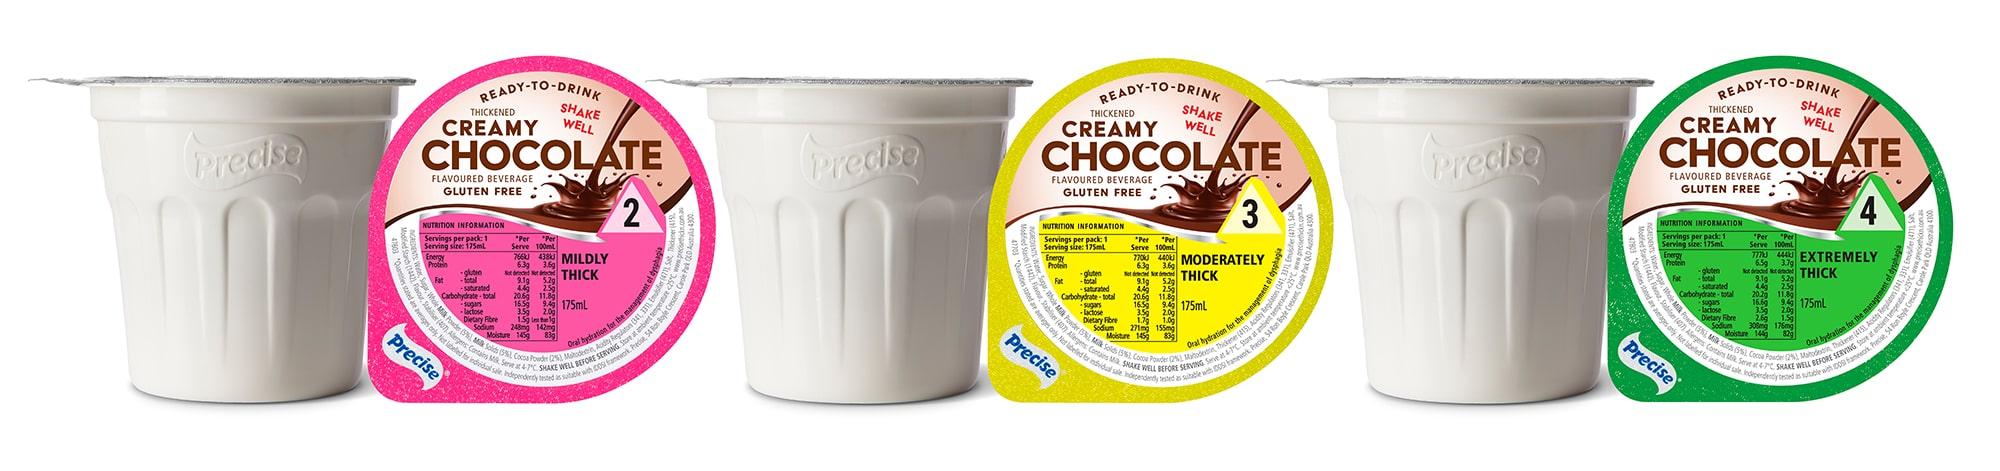 RTD Creamy Chocolate